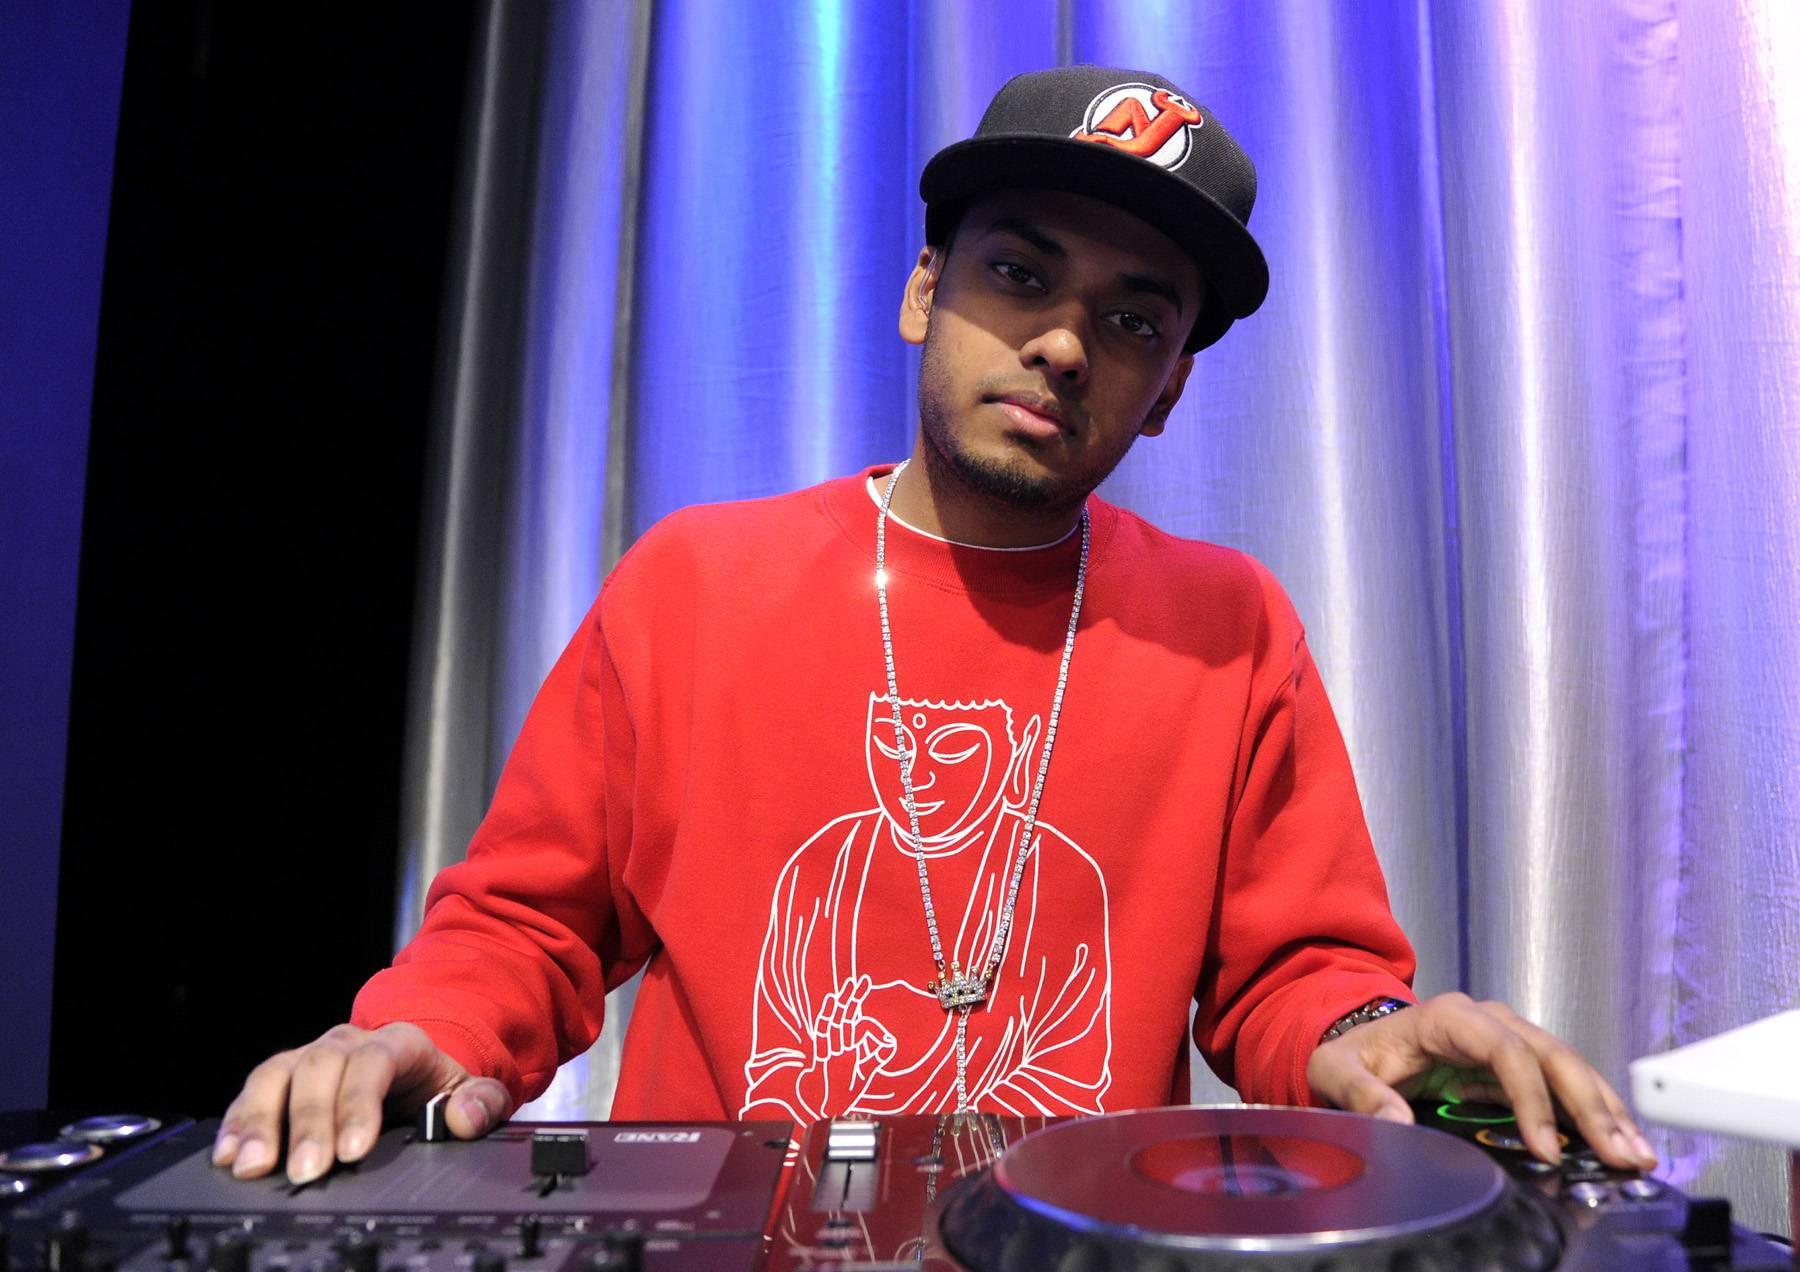 The King - DJ Spin King at 106 & Park, April 12, 2012. (Photo: John Ricard / BET)